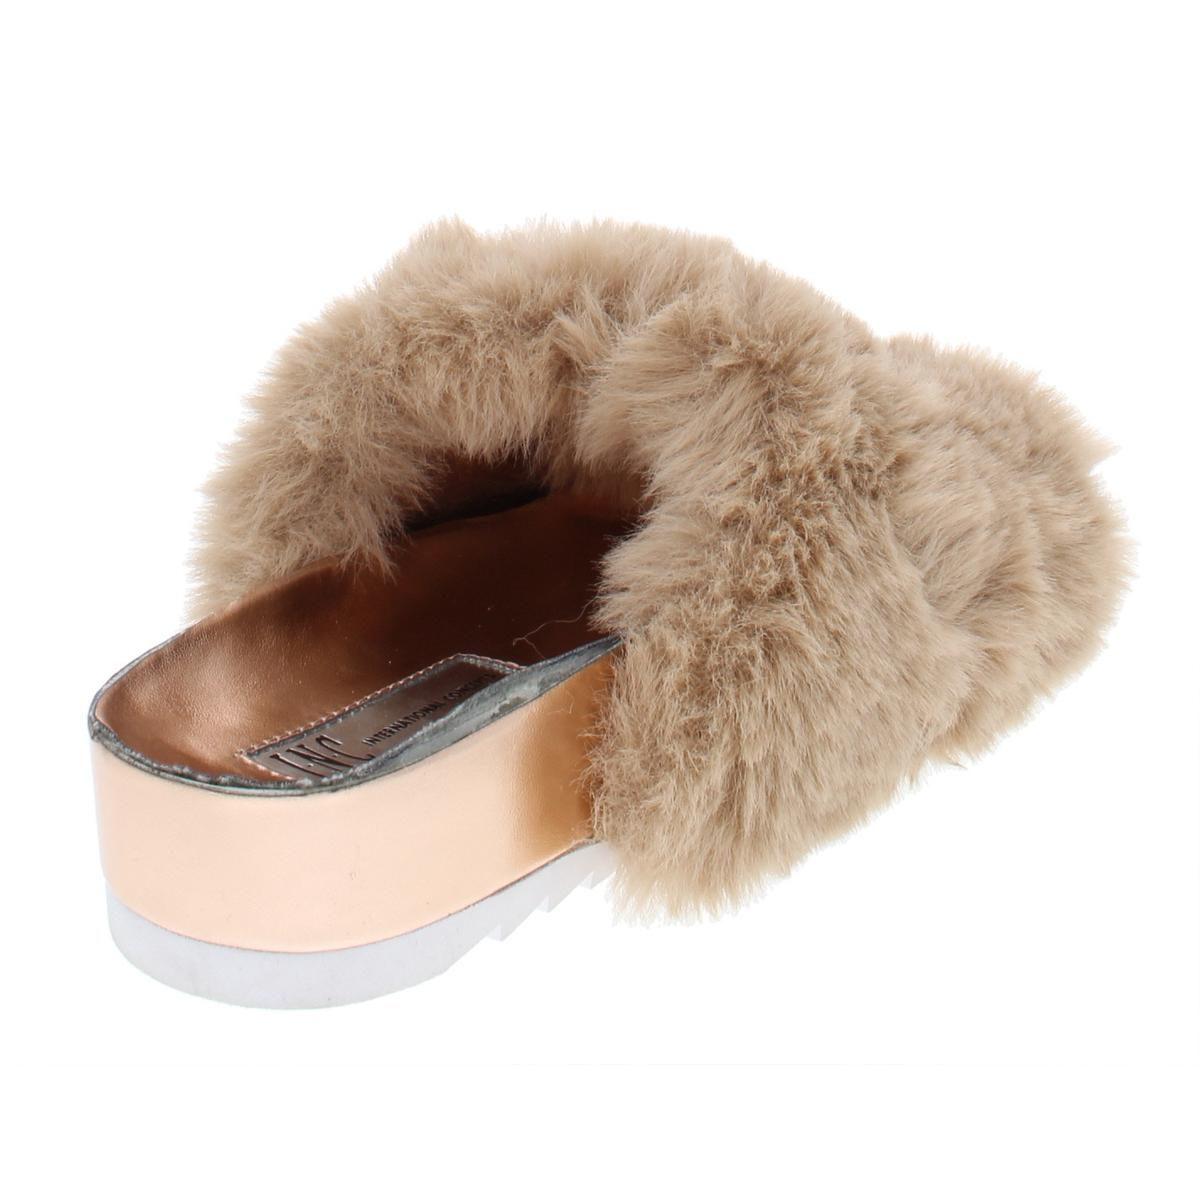 INC-Womens-Alani-Embellished-Metallic-Flat-Sandals-Shoes-BHFO-6405 thumbnail 8